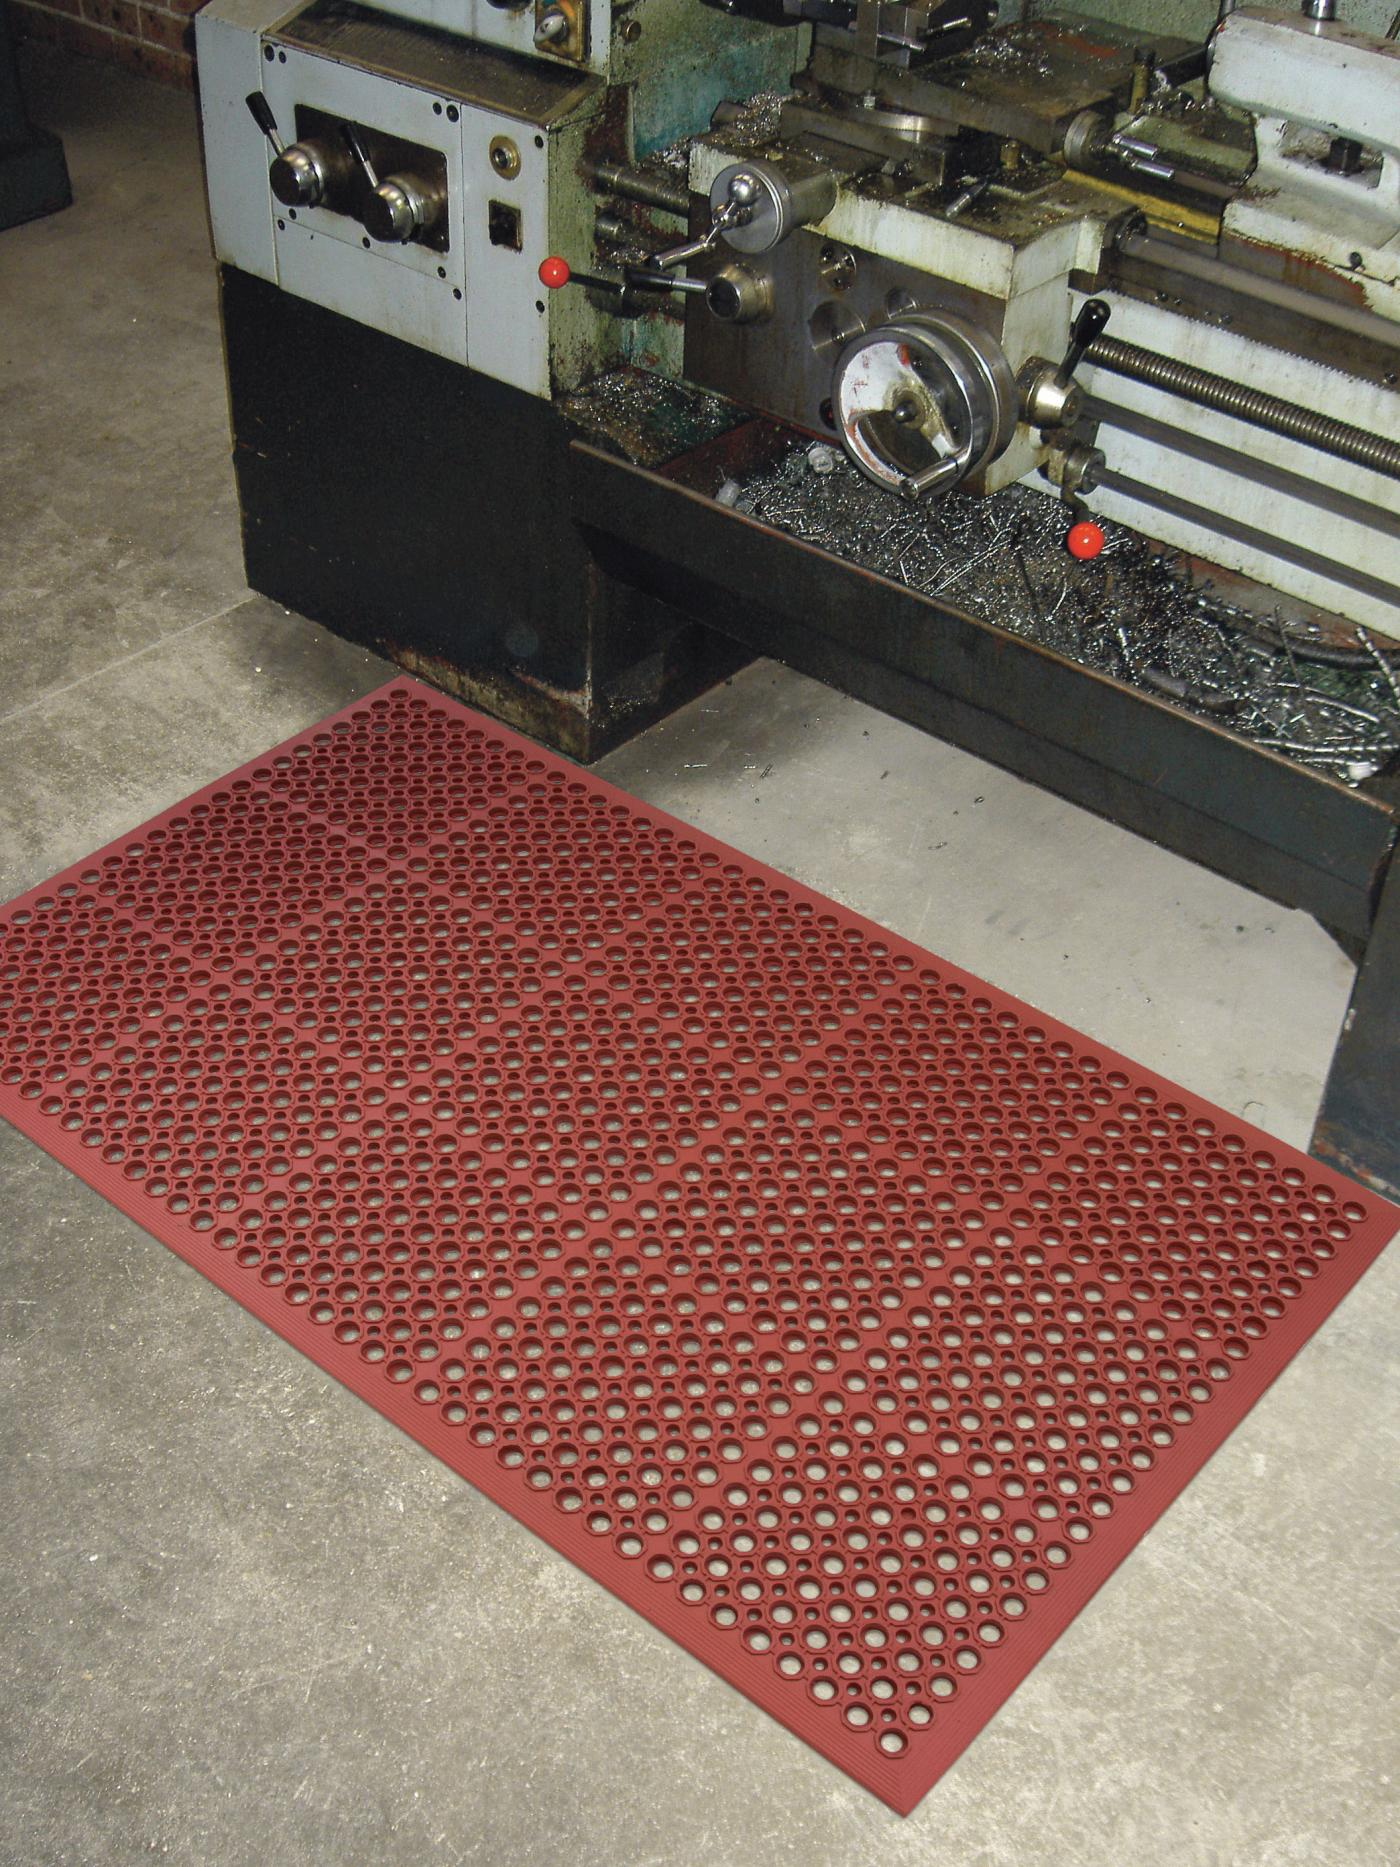 safety-cushion-mat-engineering-workshop